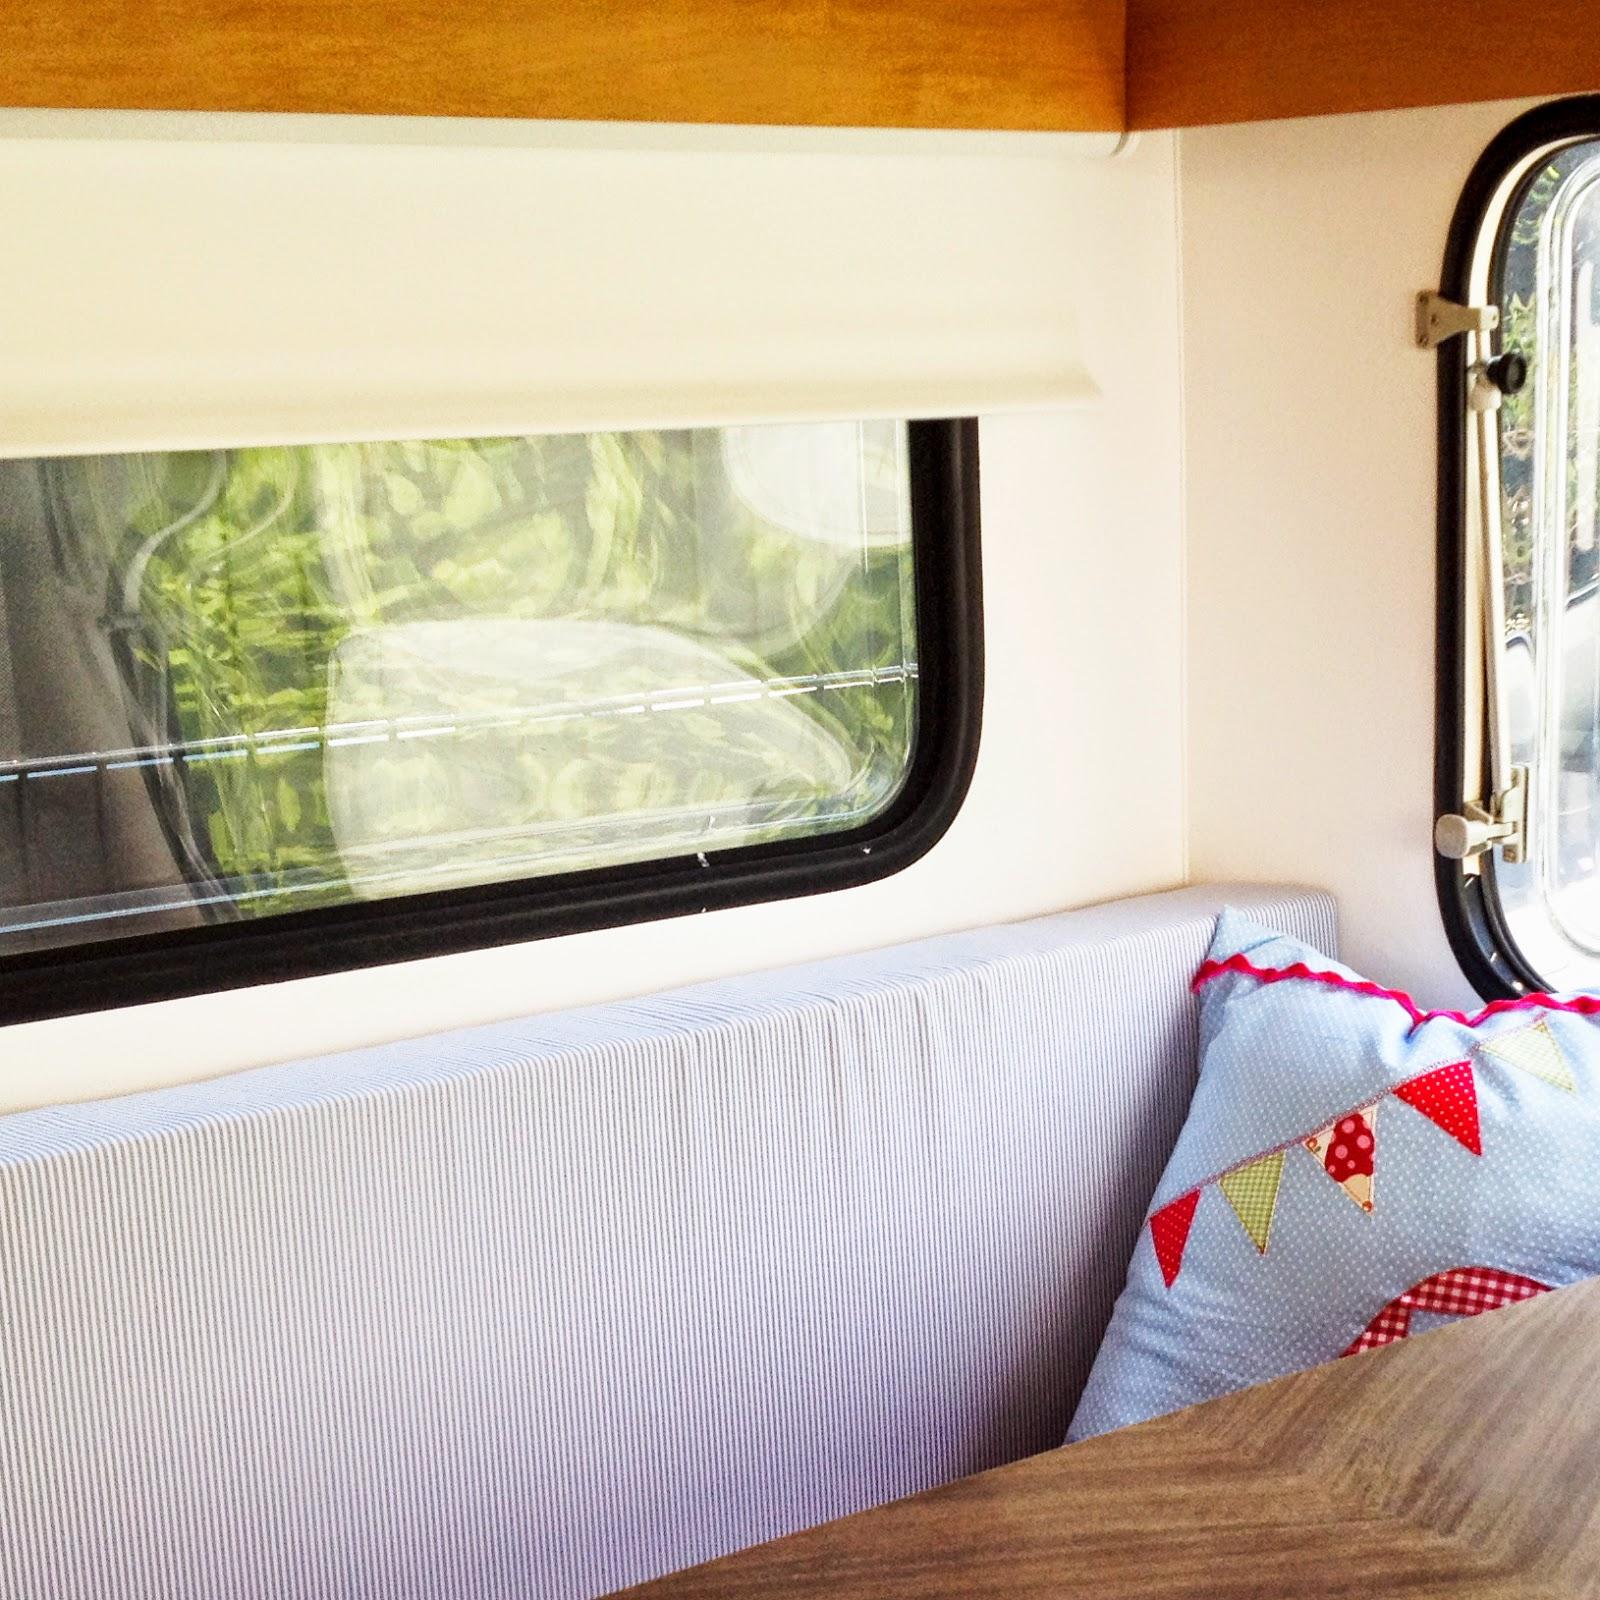 lolo und theo september 2014. Black Bedroom Furniture Sets. Home Design Ideas